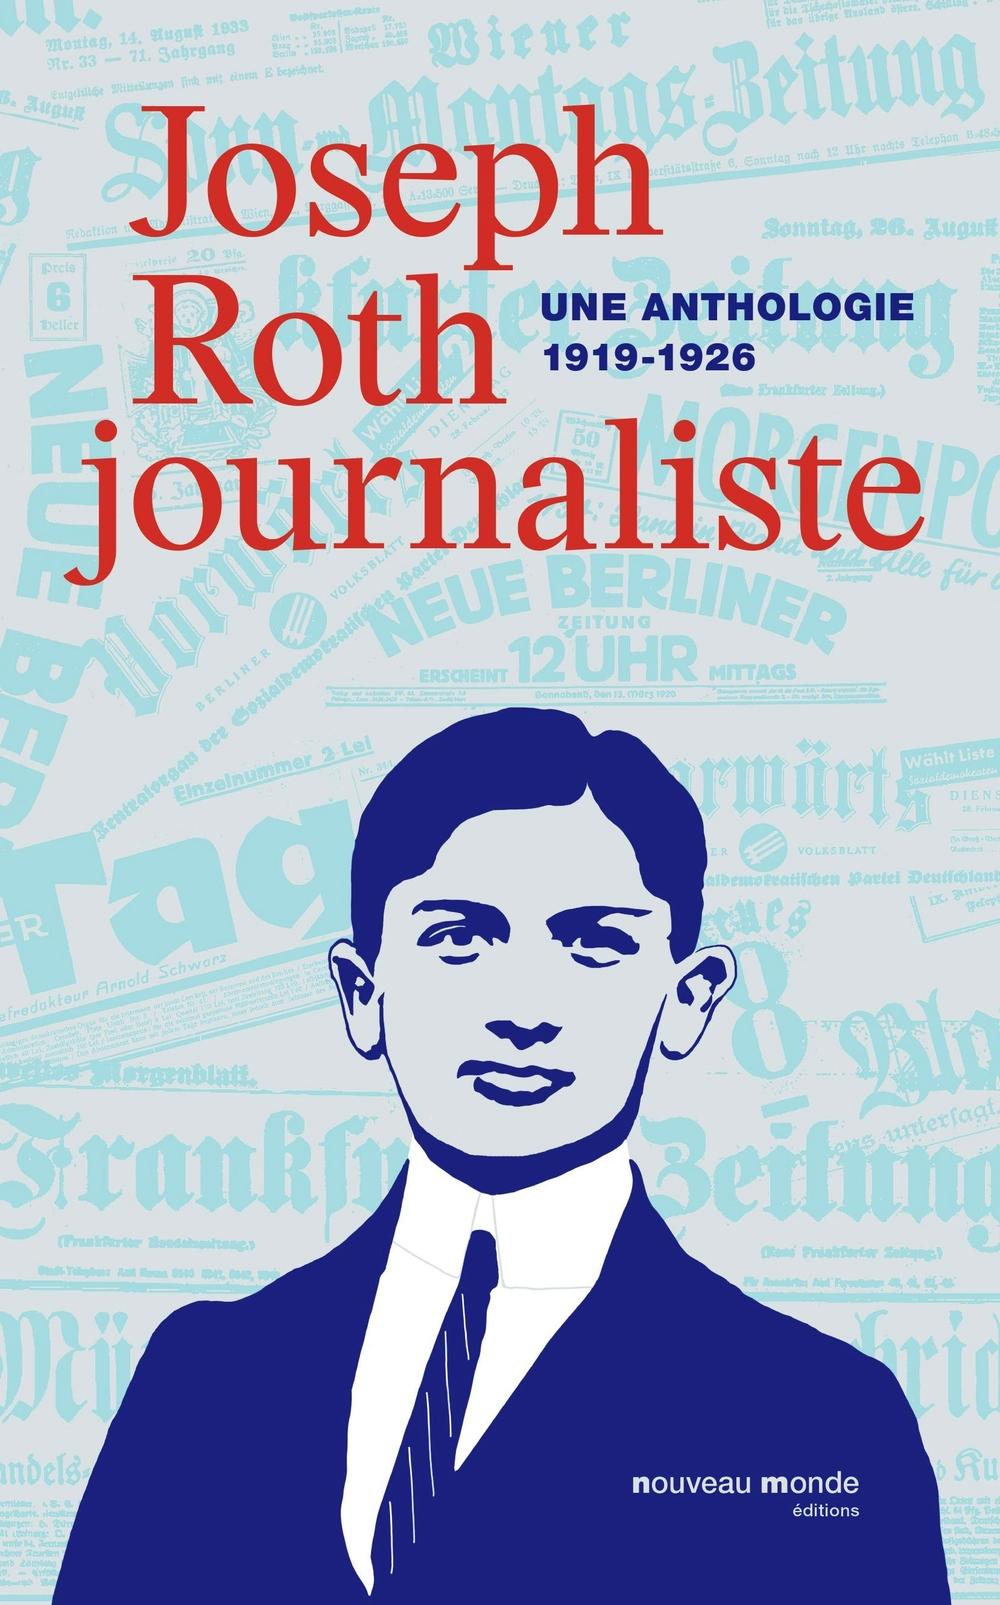 Joseph Roth journaliste